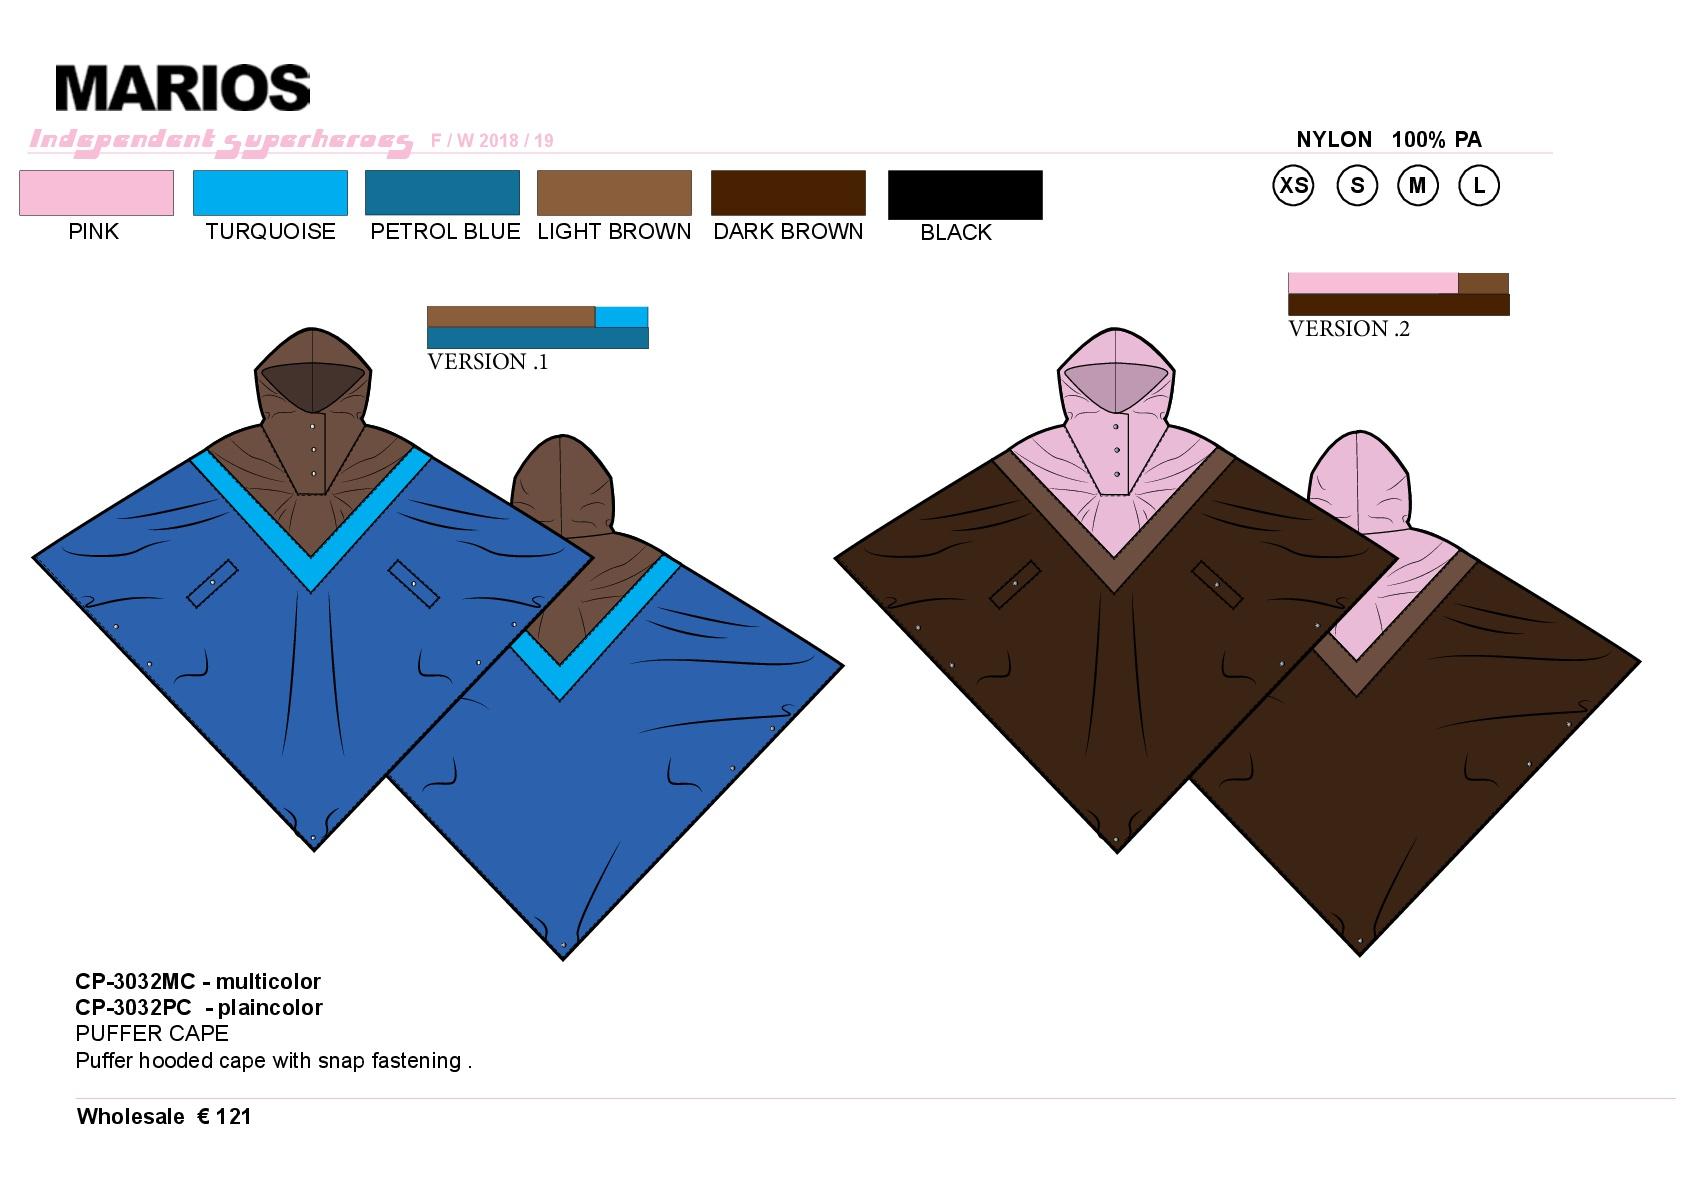 F:W-18-19-MARIOS-LINESHEET-indipendent-superheroes-wholesale-price-013.jpg